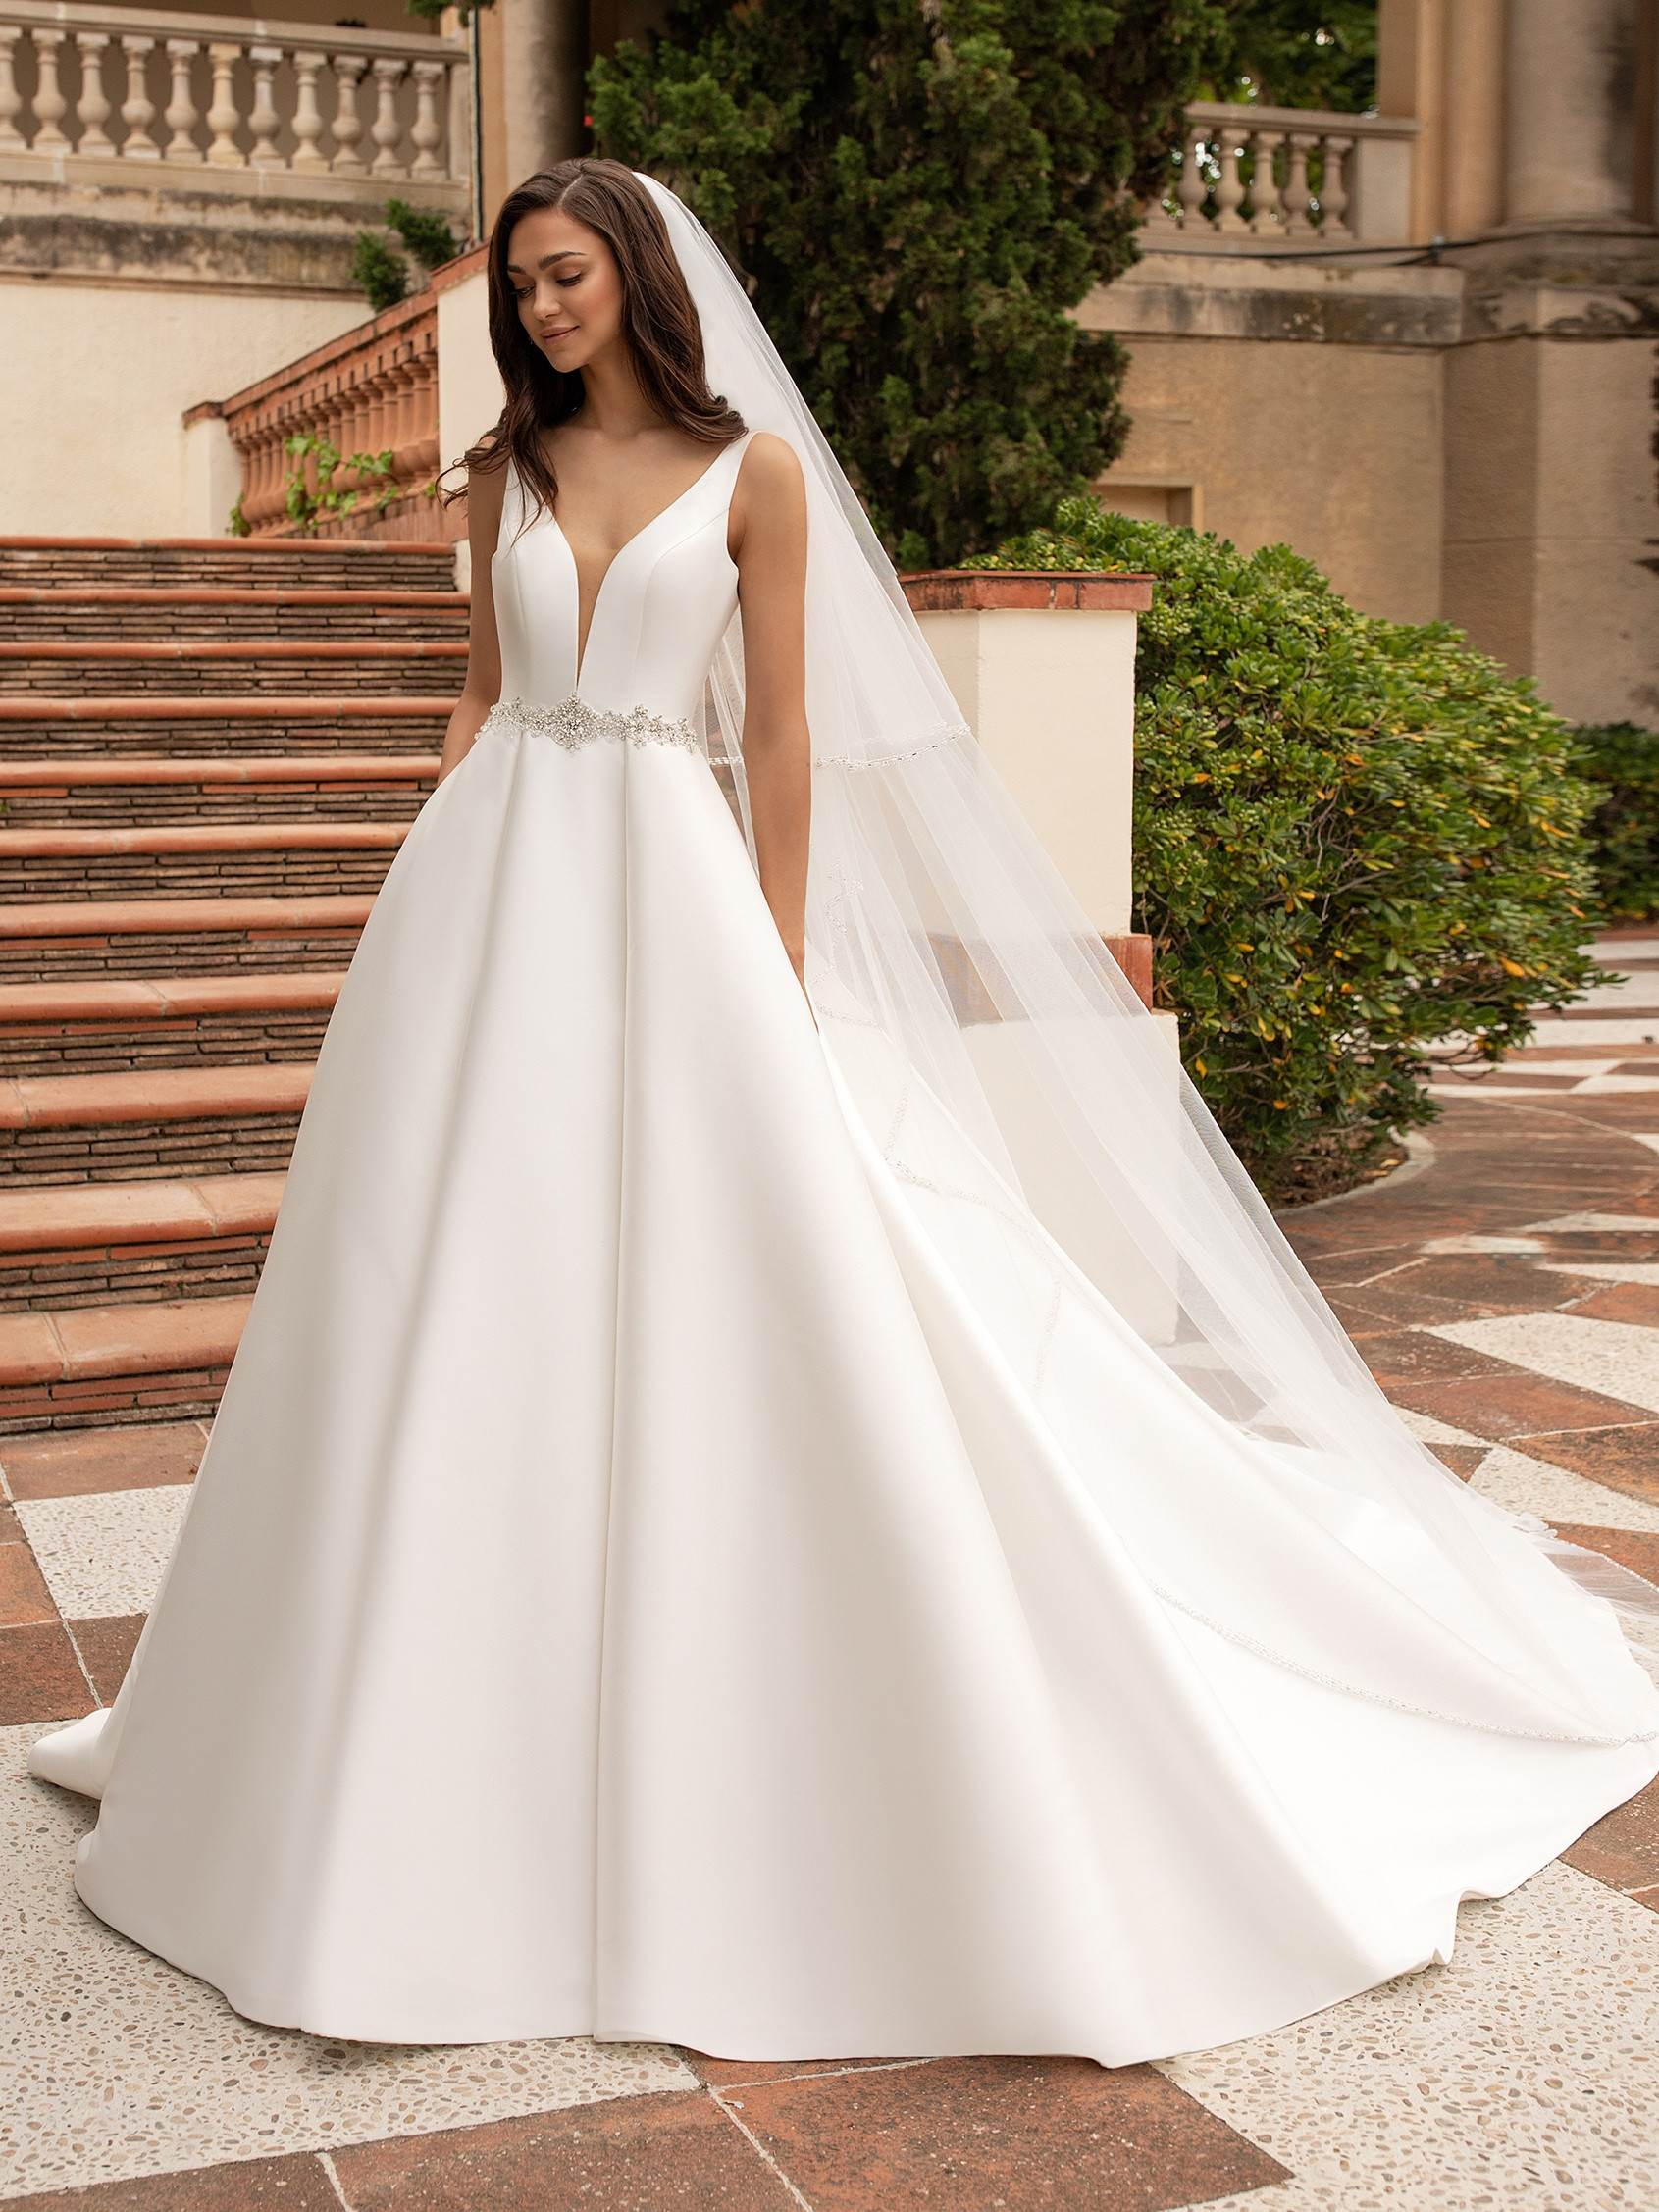 Malena menyasszonyi ruha - Pronovias 2021